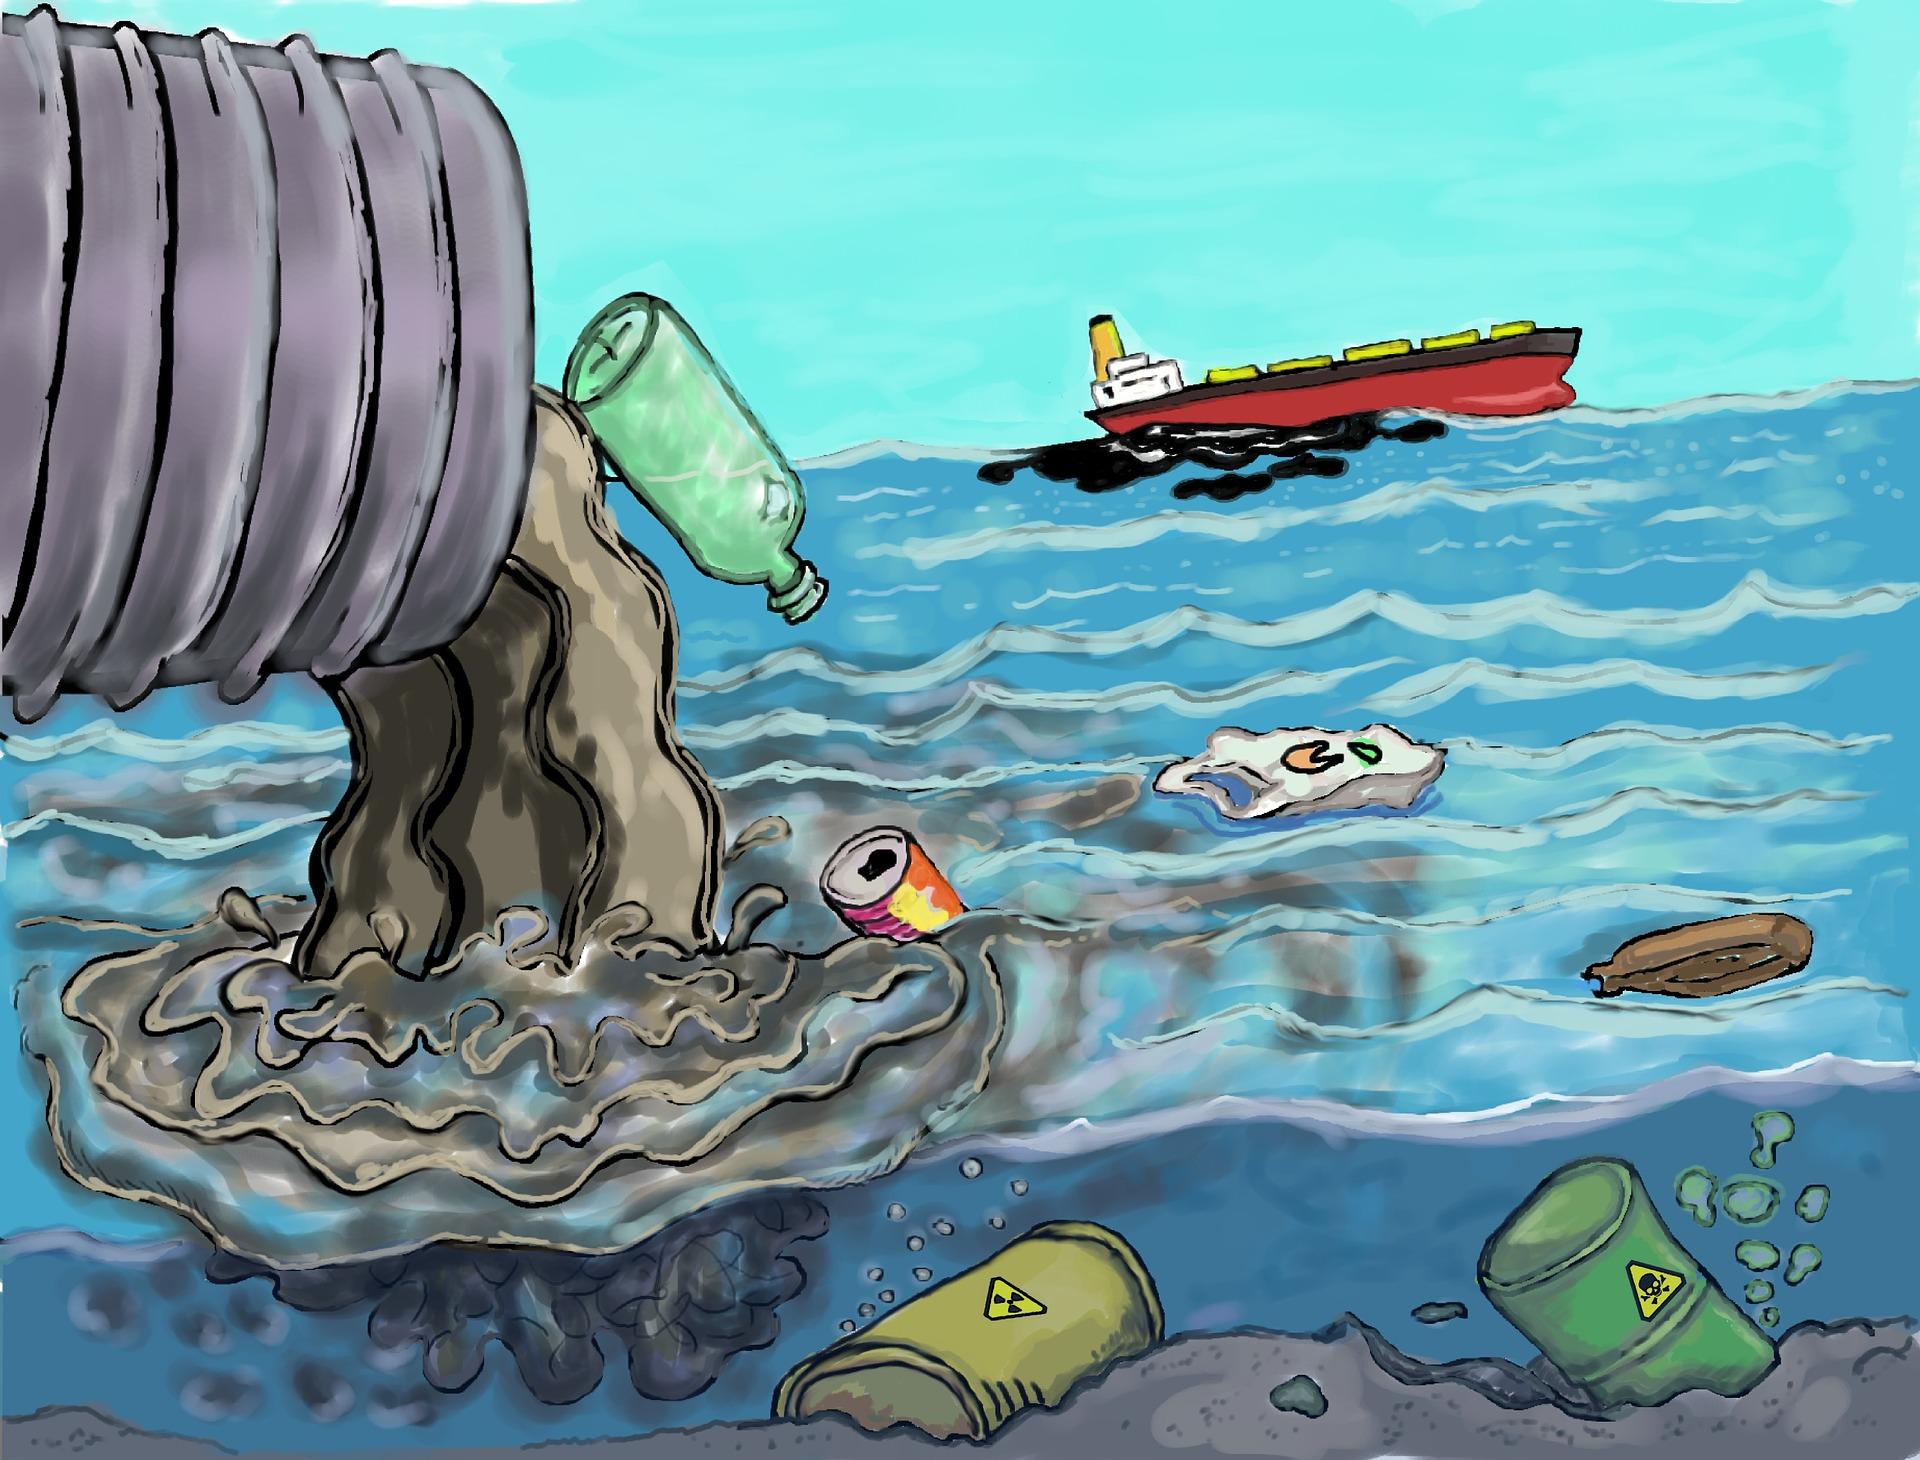 pollution-1603644_1920